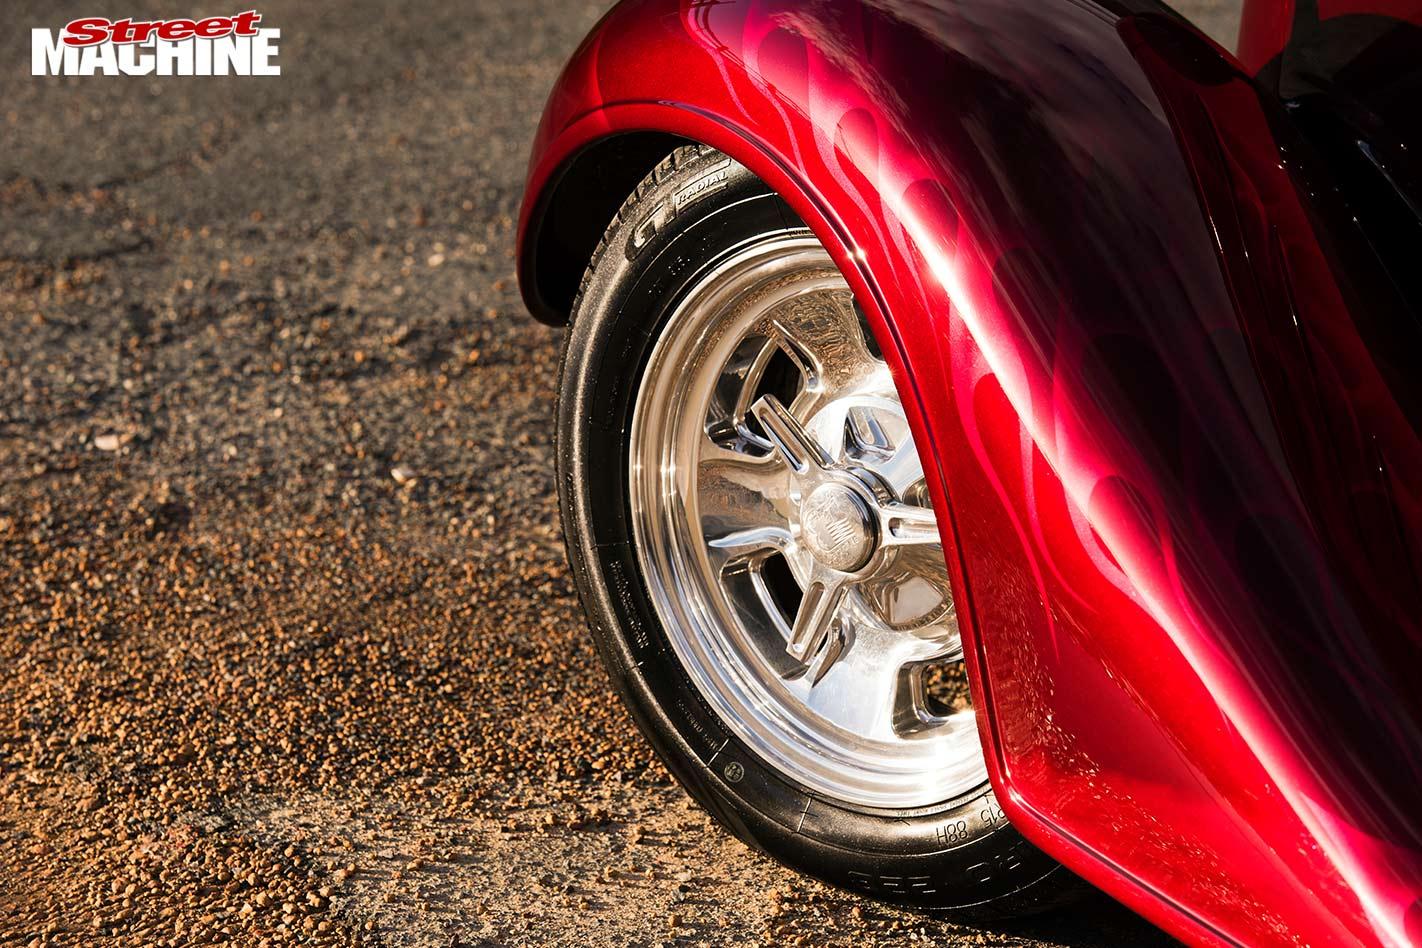 Chevy four-door sedan wheel